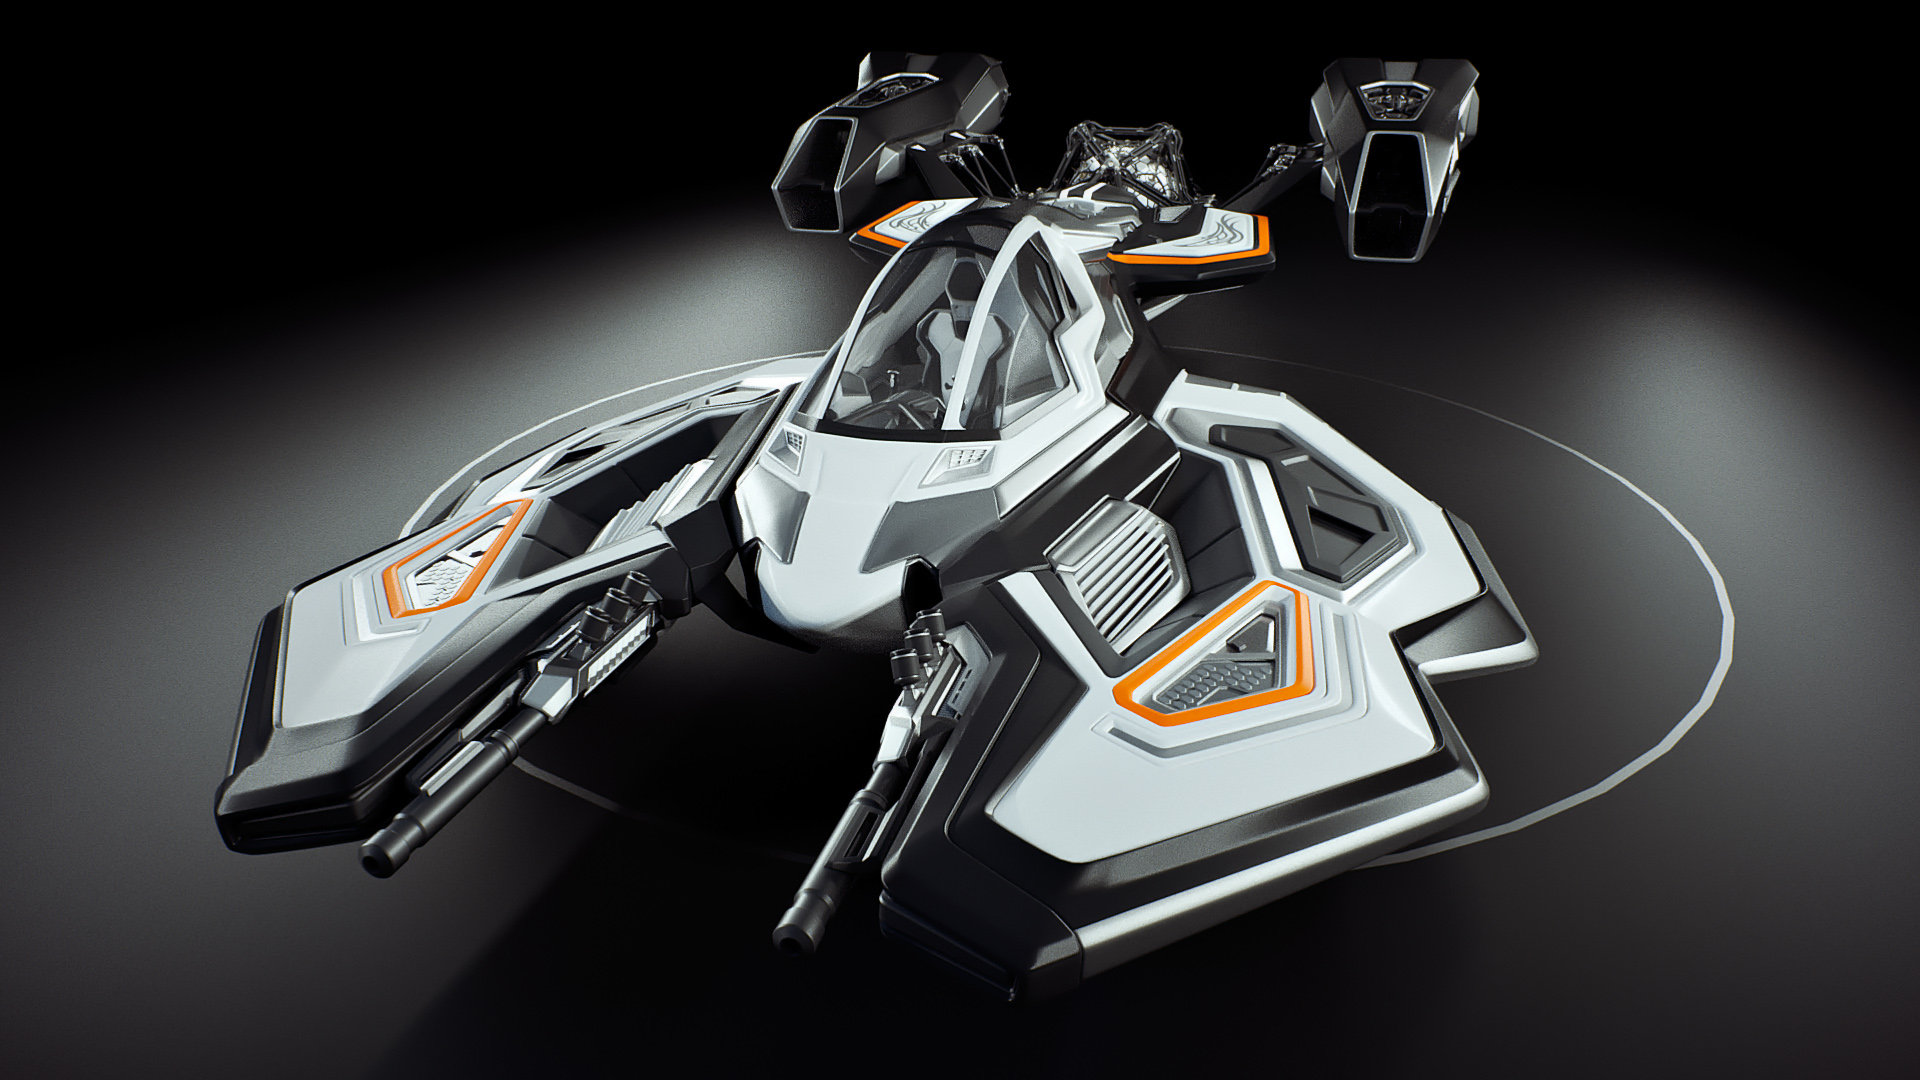 Johan de leenheer 3d spaceship faucer fuga mx230e 11